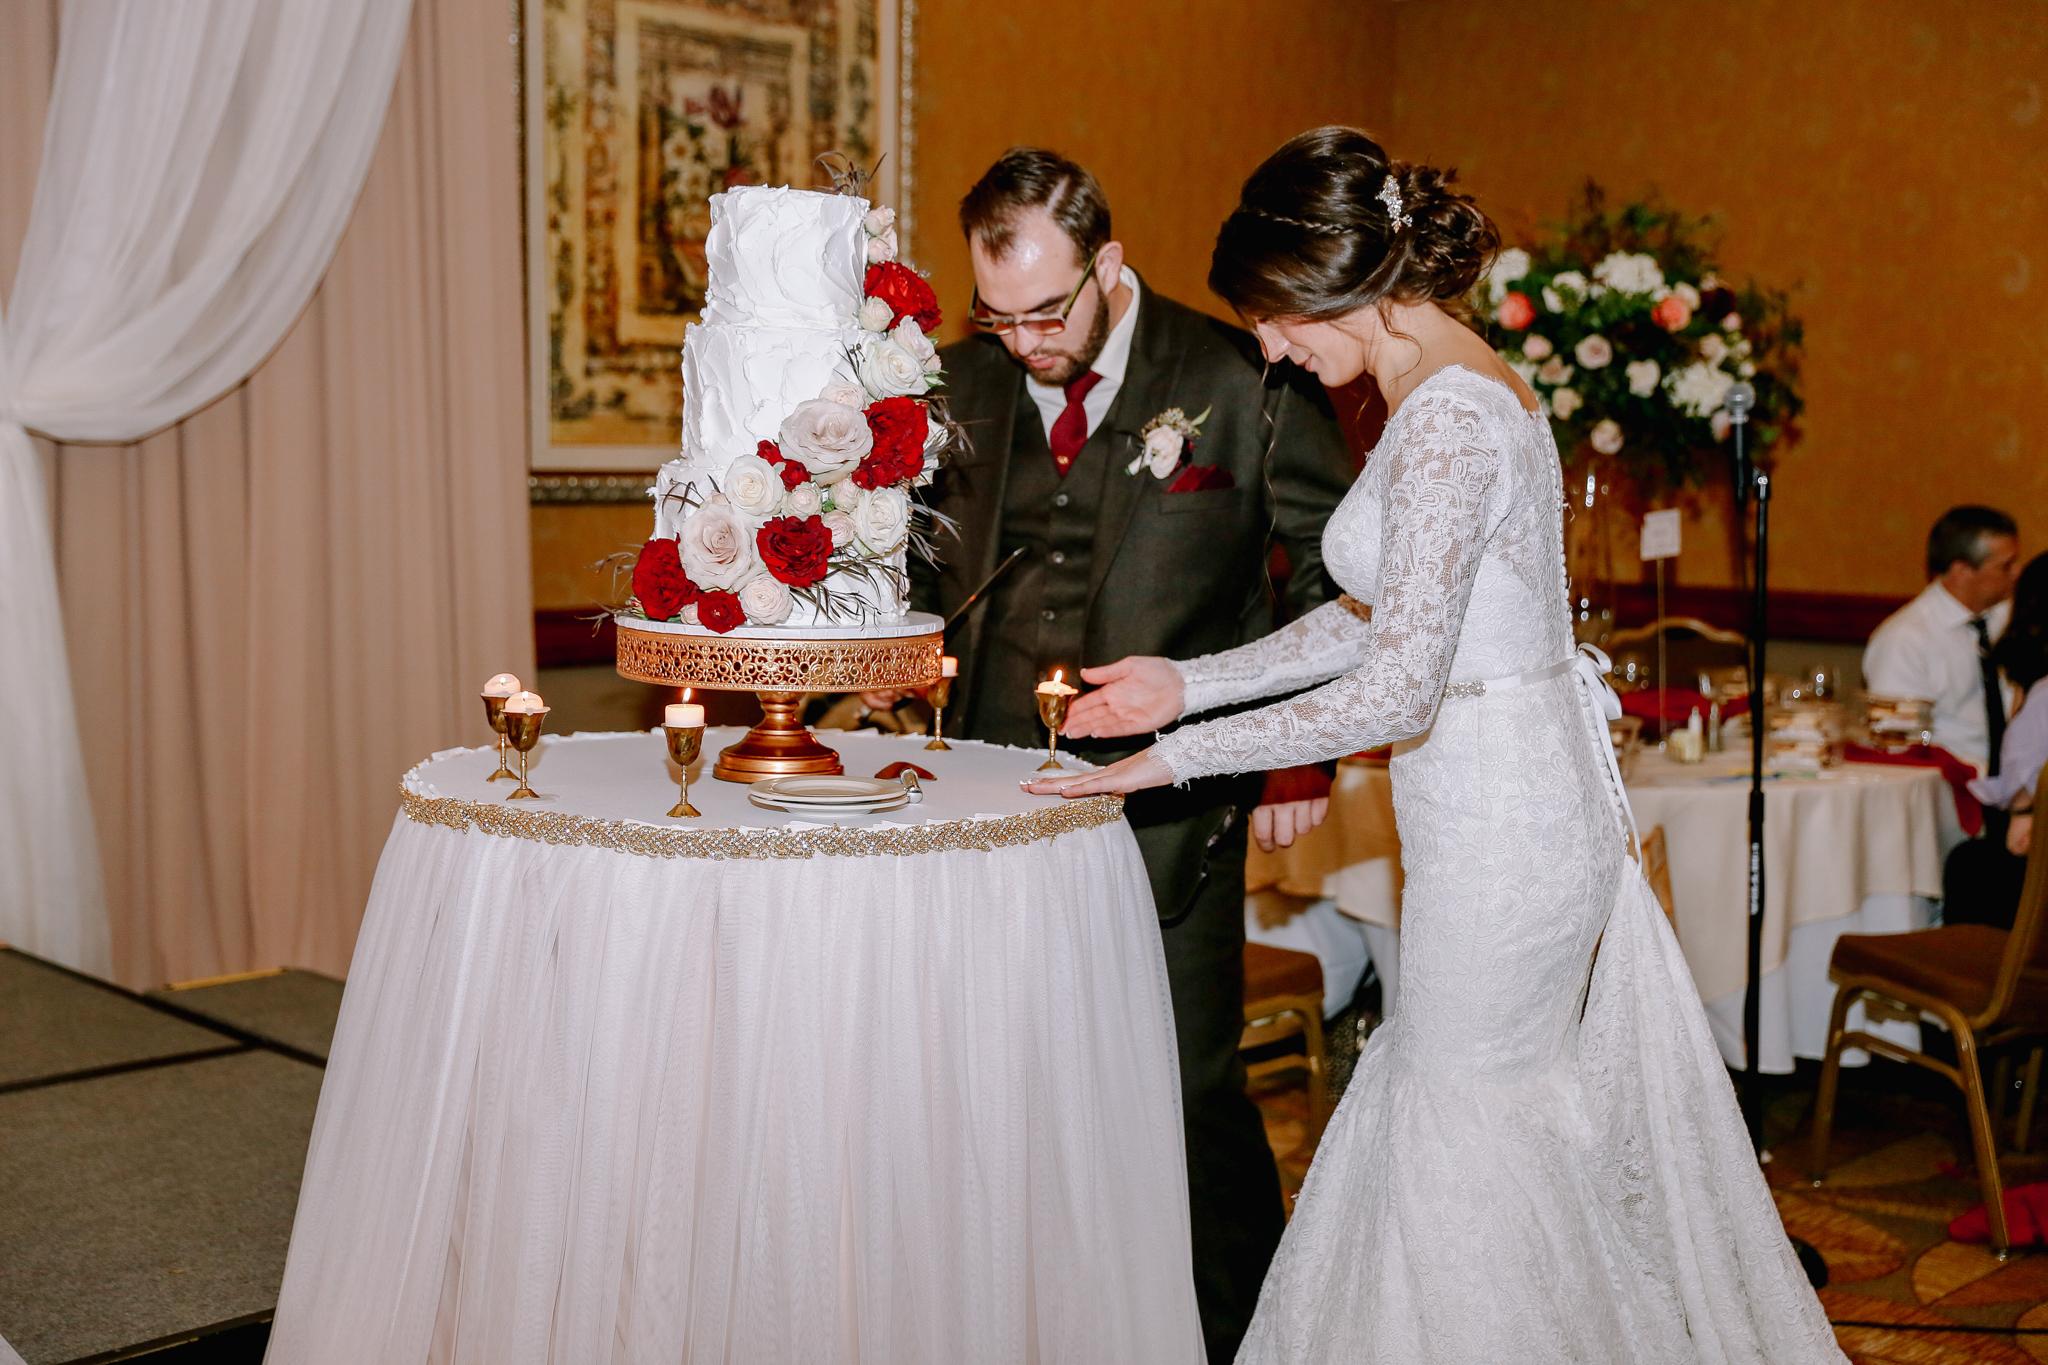 Manu and Laura - Portland Wedding Photographer - 59.jpg